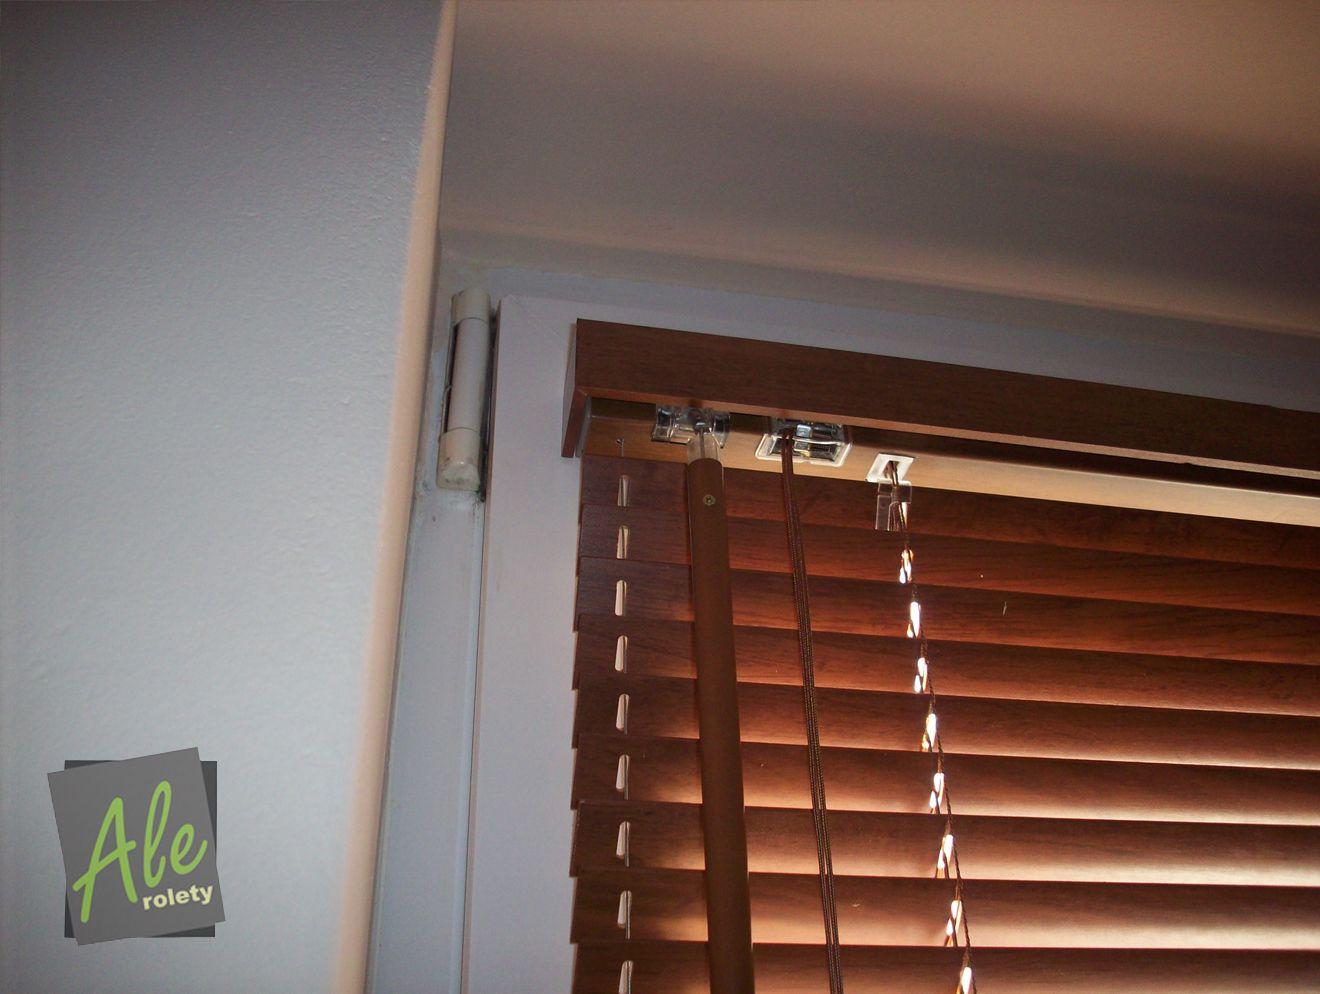 Eyebrow window coverings  wooden blinds rolety drewniane  roller blinds  pinterest